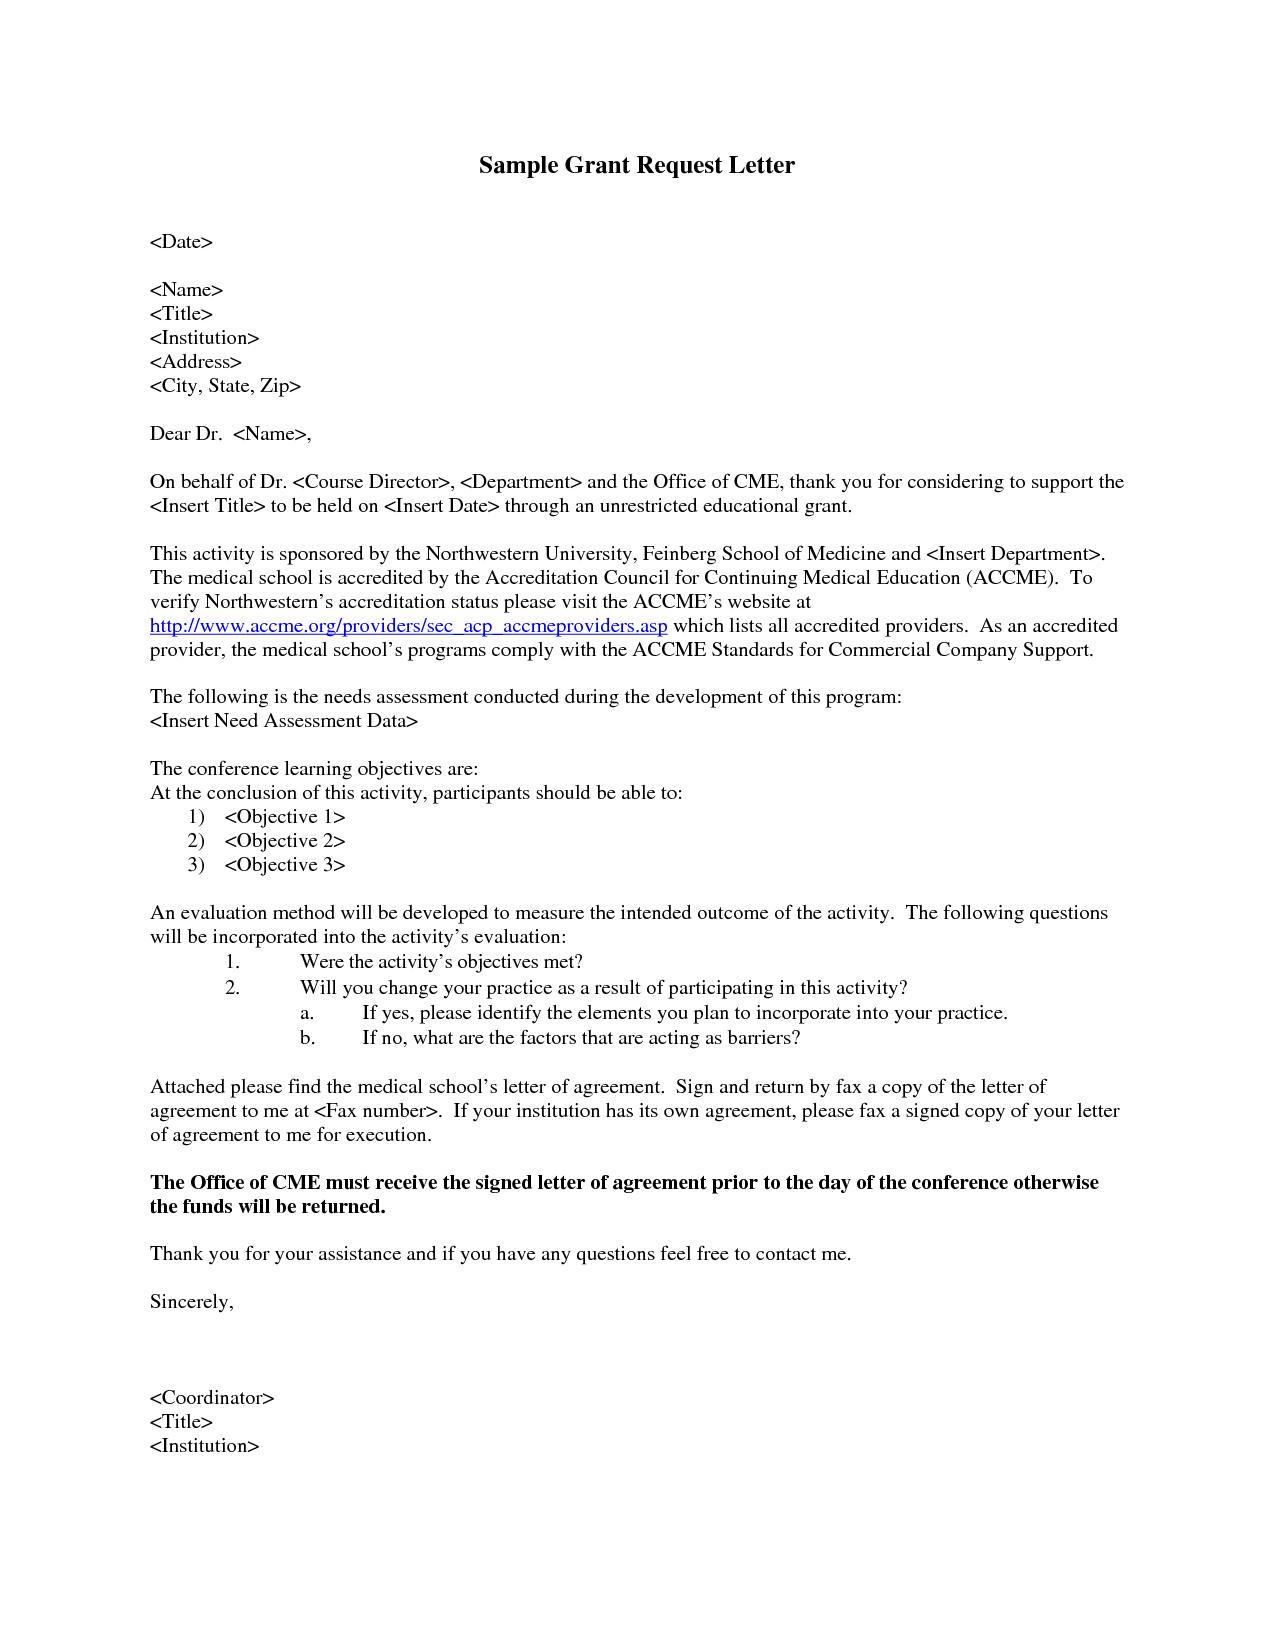 Grant Application Cover Letter Sample. Cover Letter Grant Military  Bralicious Co . Grant Application Cover Letter Sample